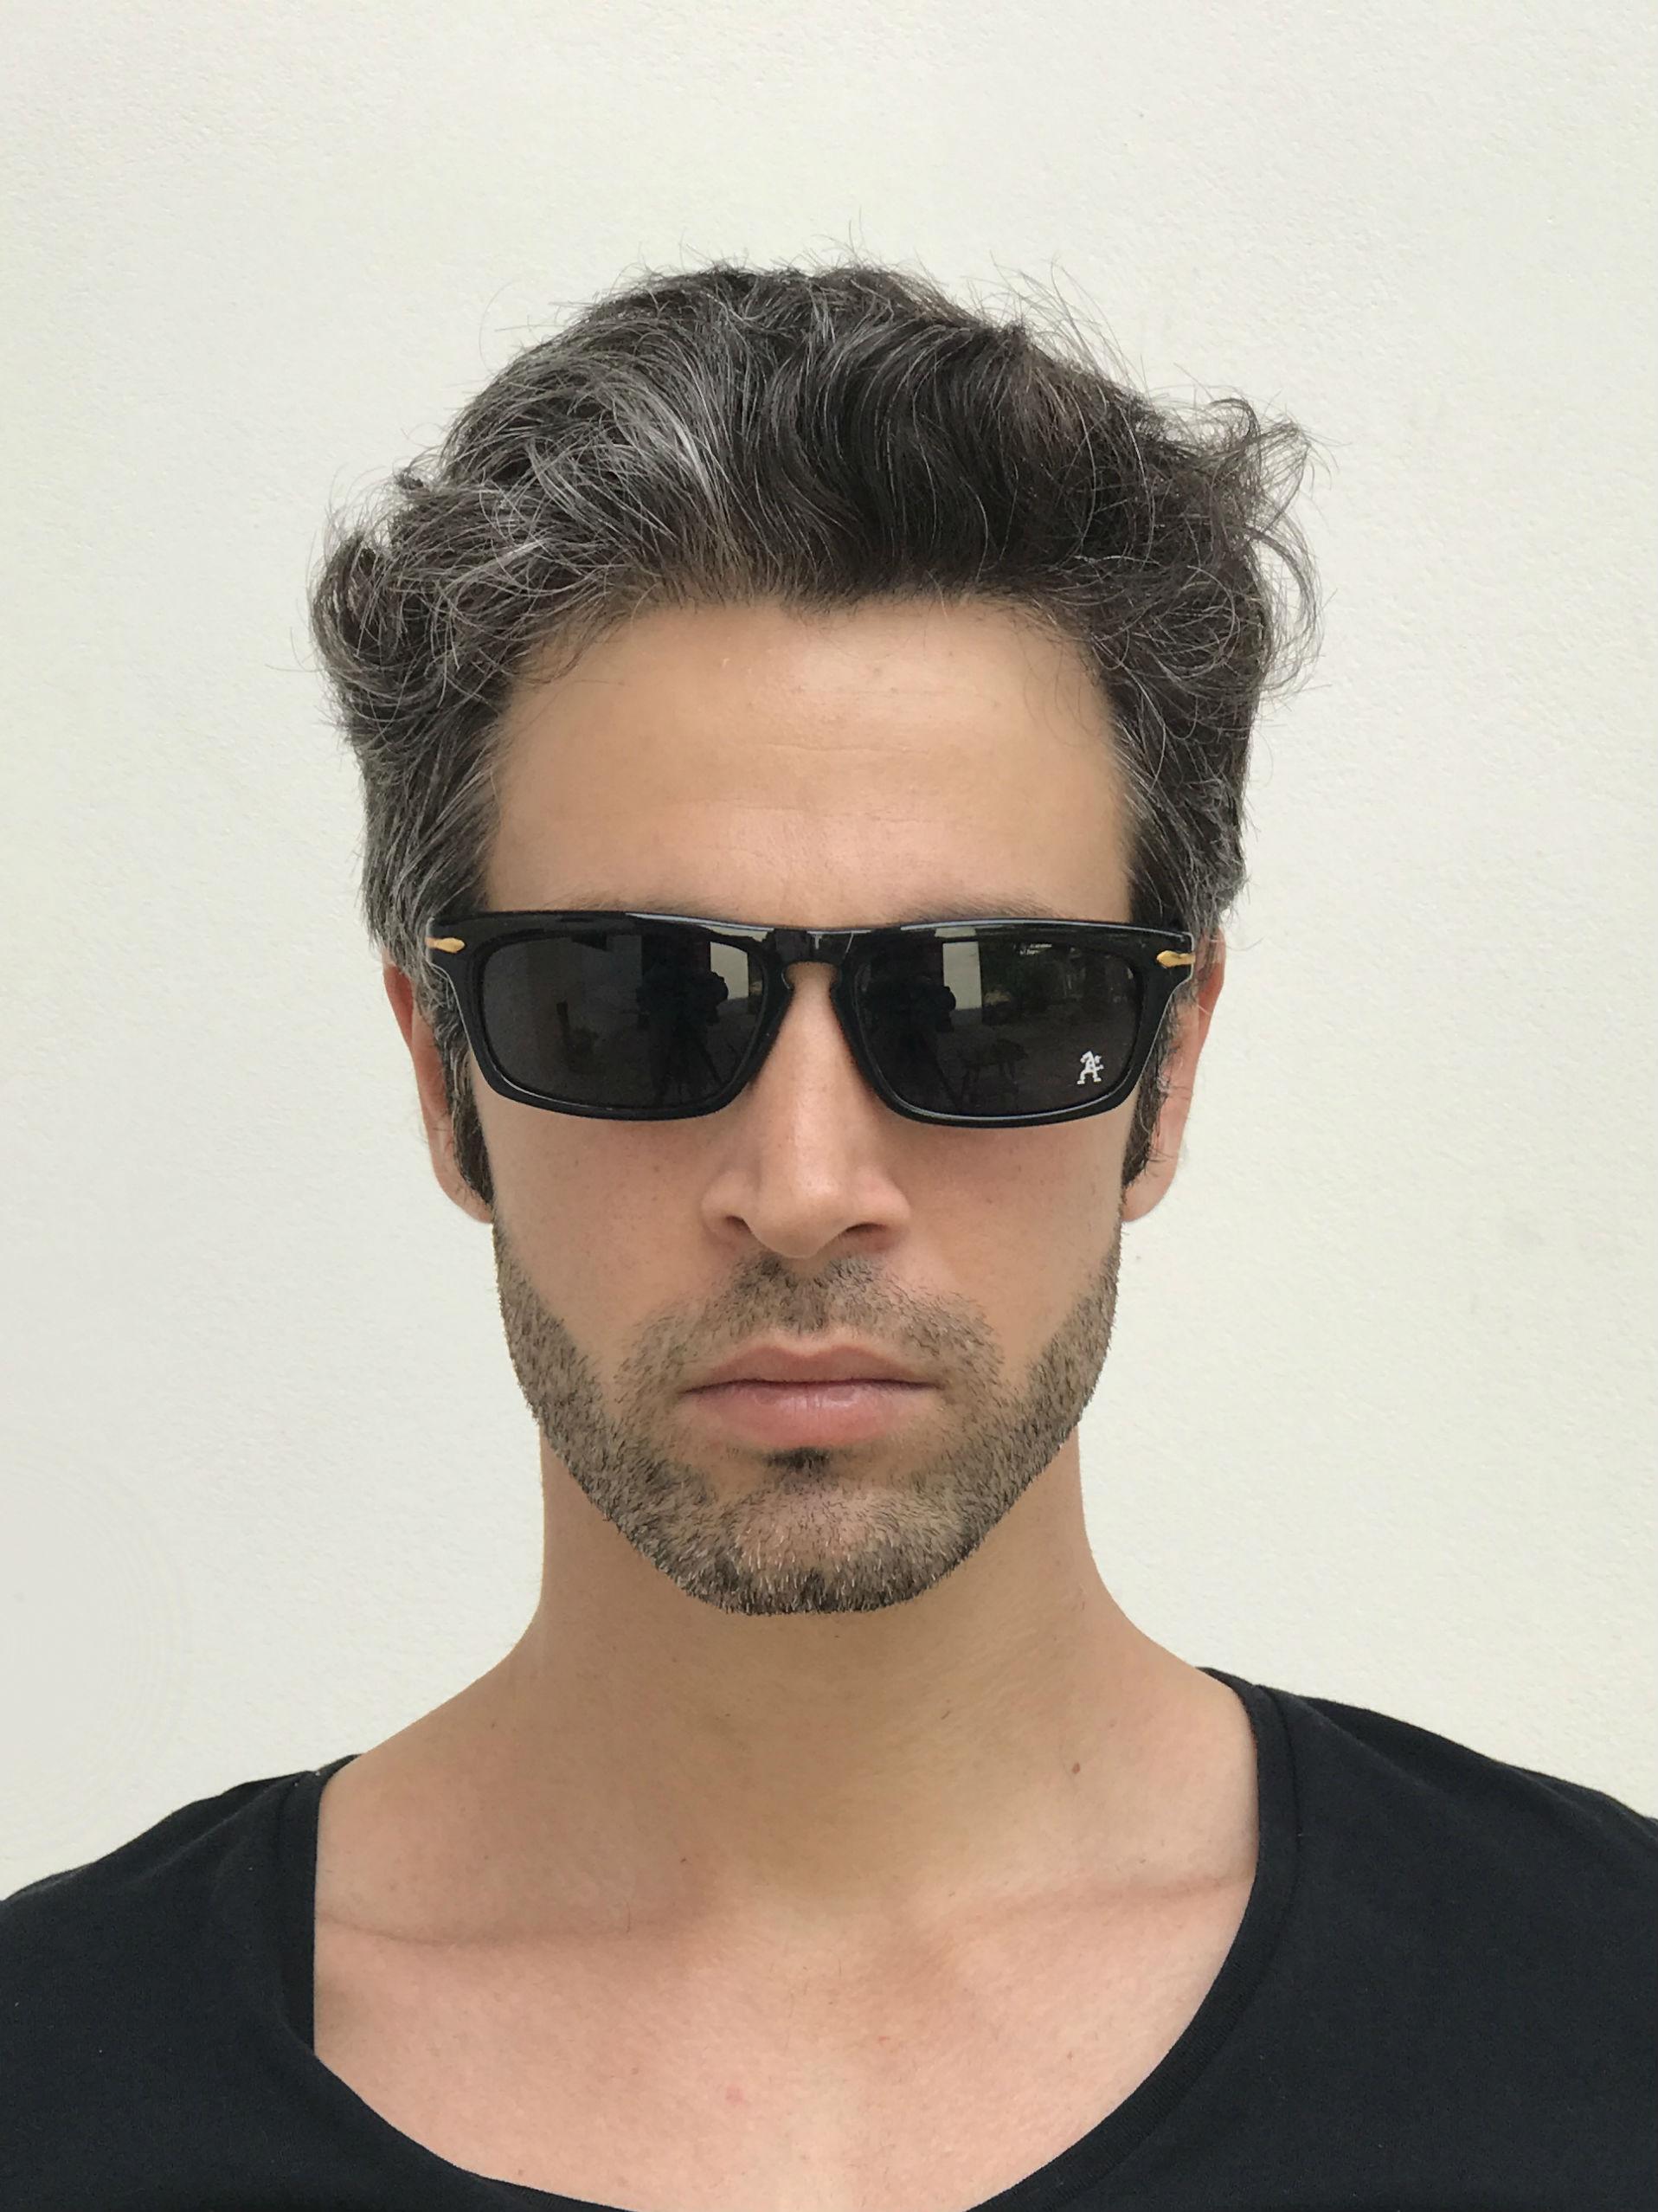 Black oblong sunglasses for men NOS 90's punk era